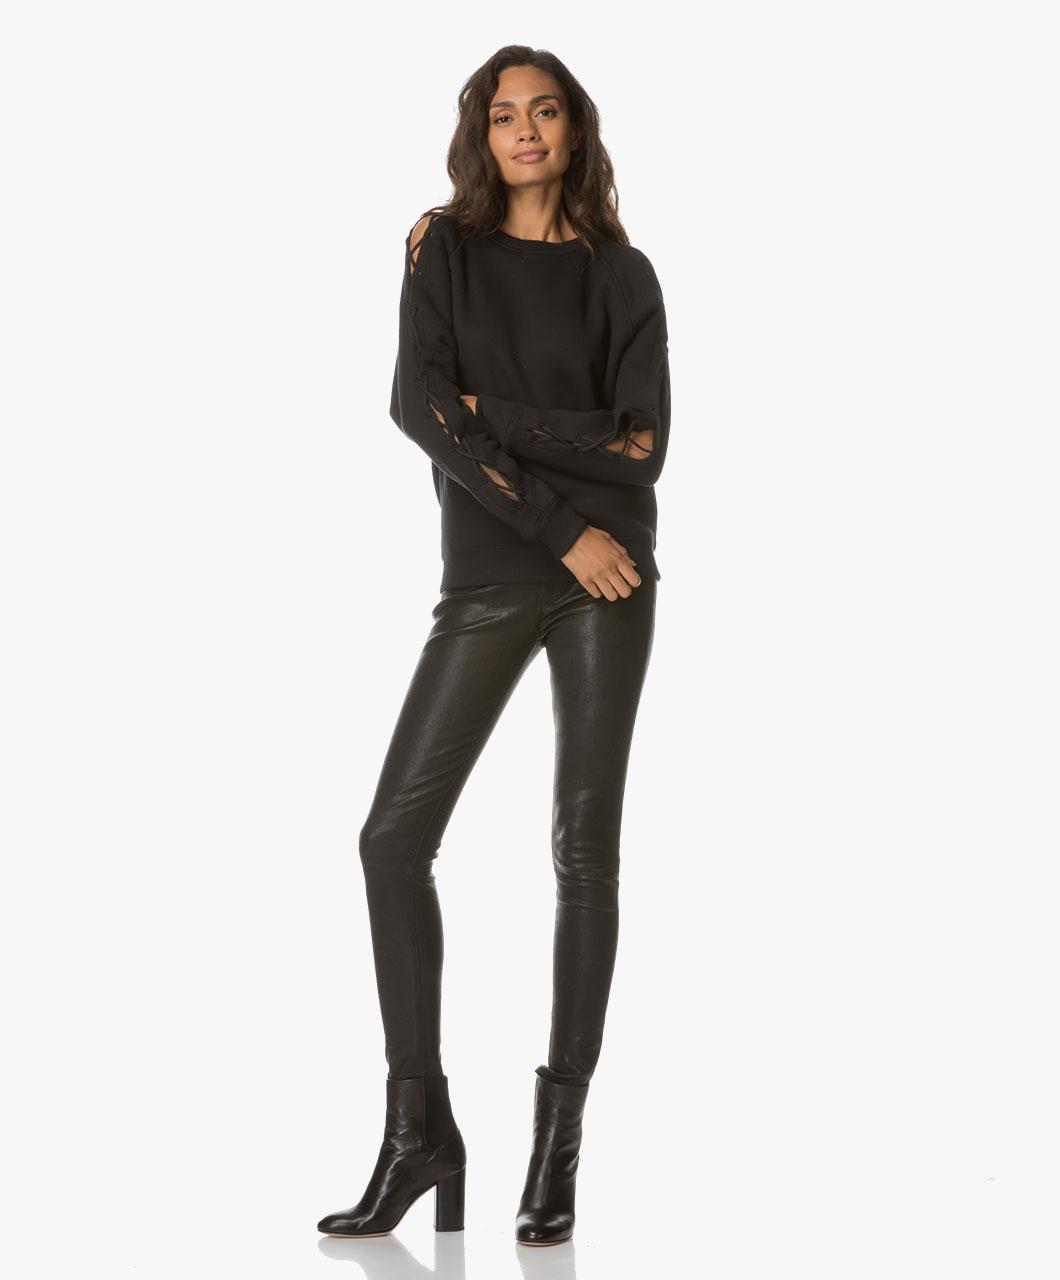 Danica collins leather skirt